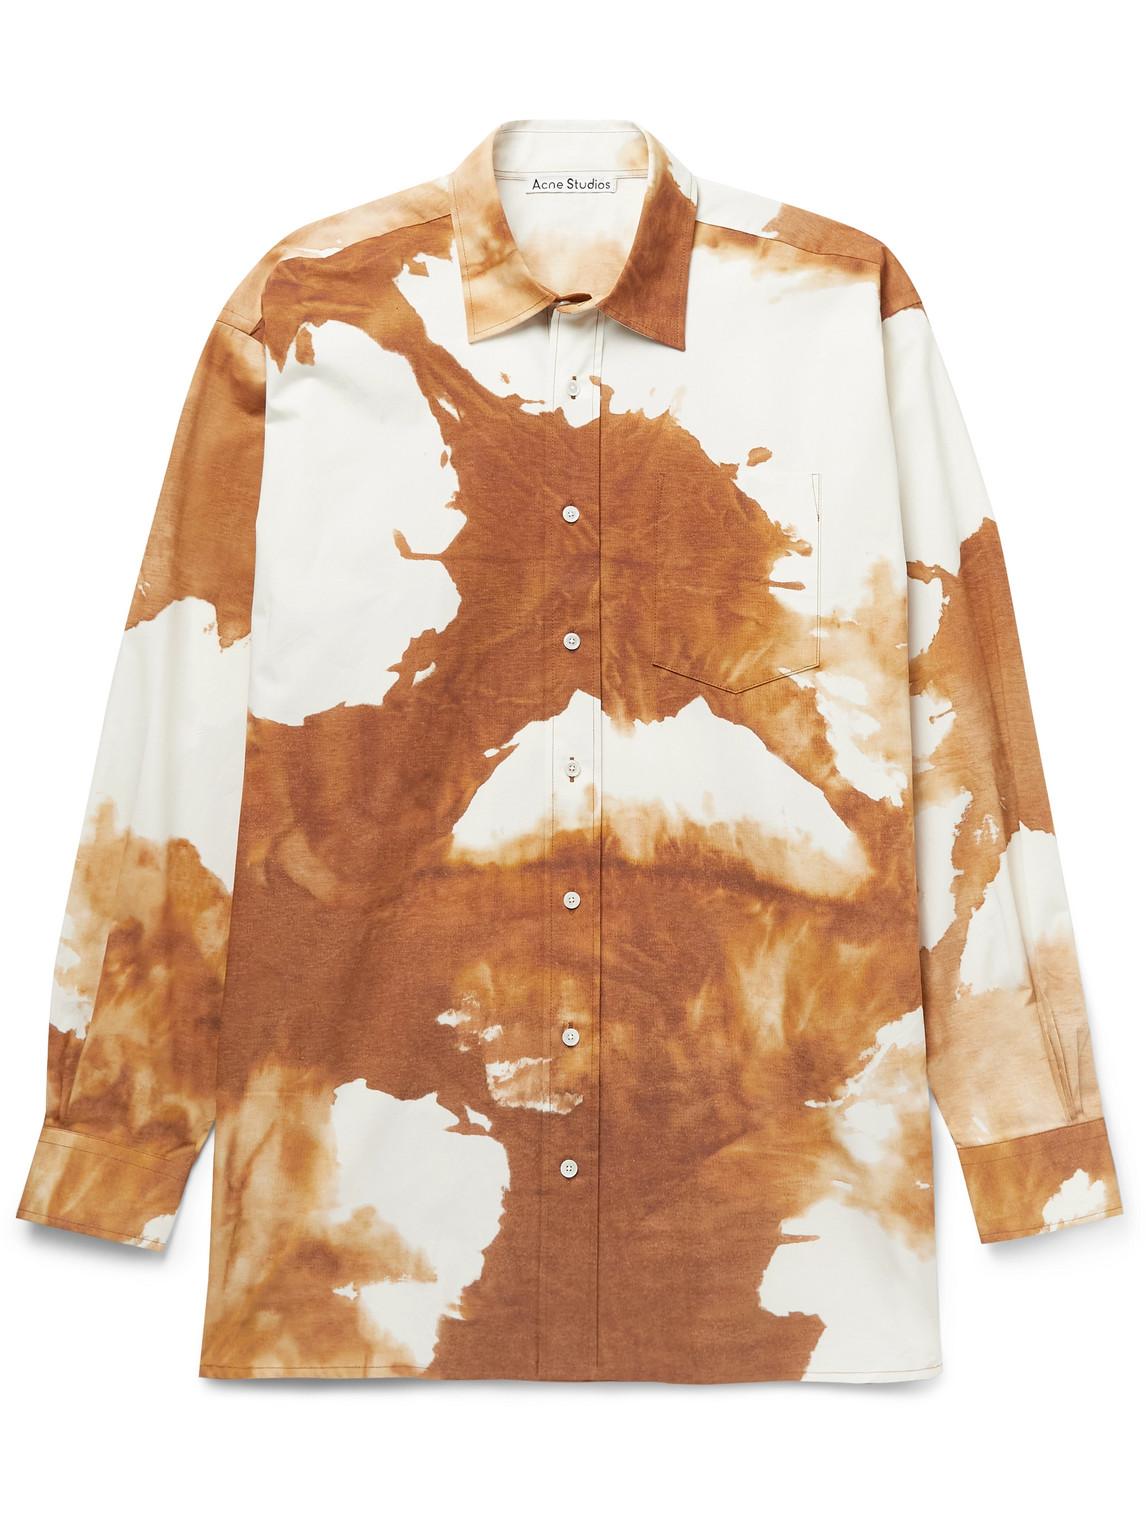 Acne Studios Clothing ATLENT OVERSIZED TIE-DYED STRETCH-COTTON POPLIN SHIRT